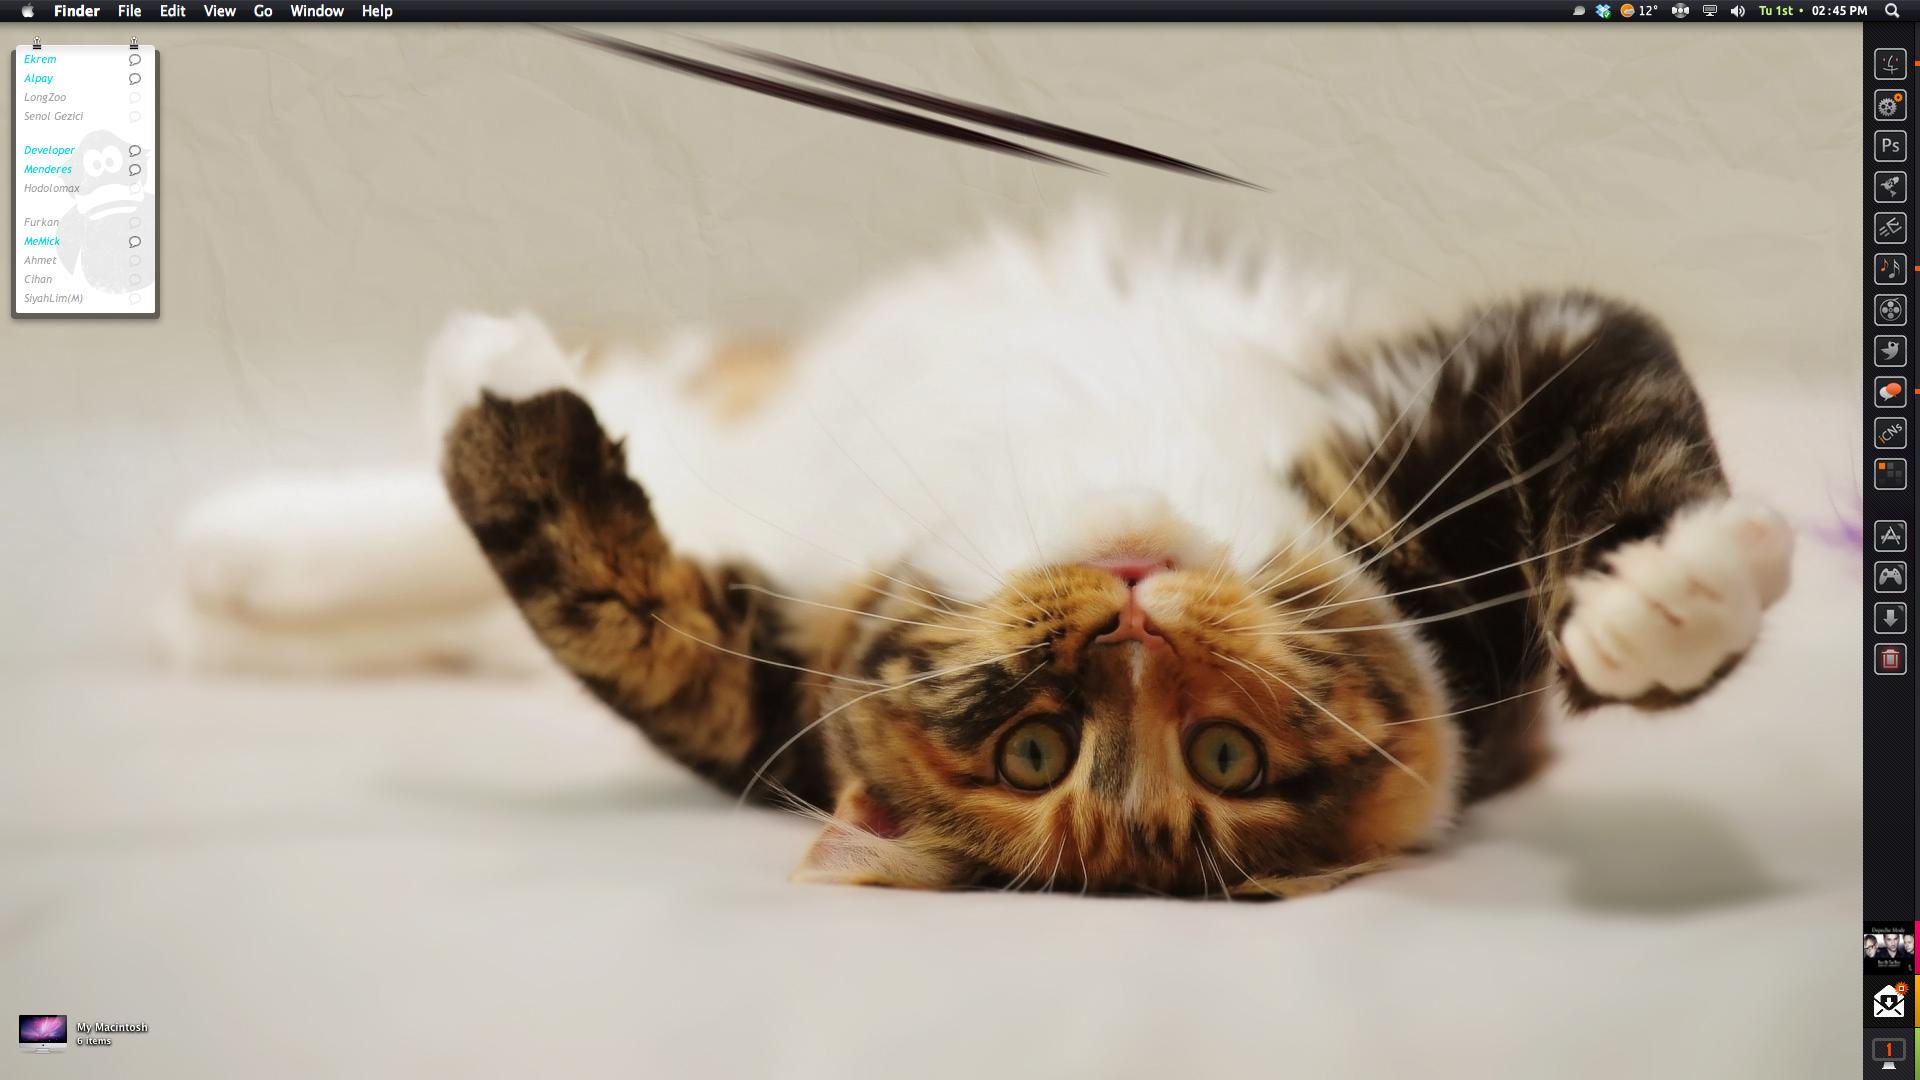 Catty by neodesktop